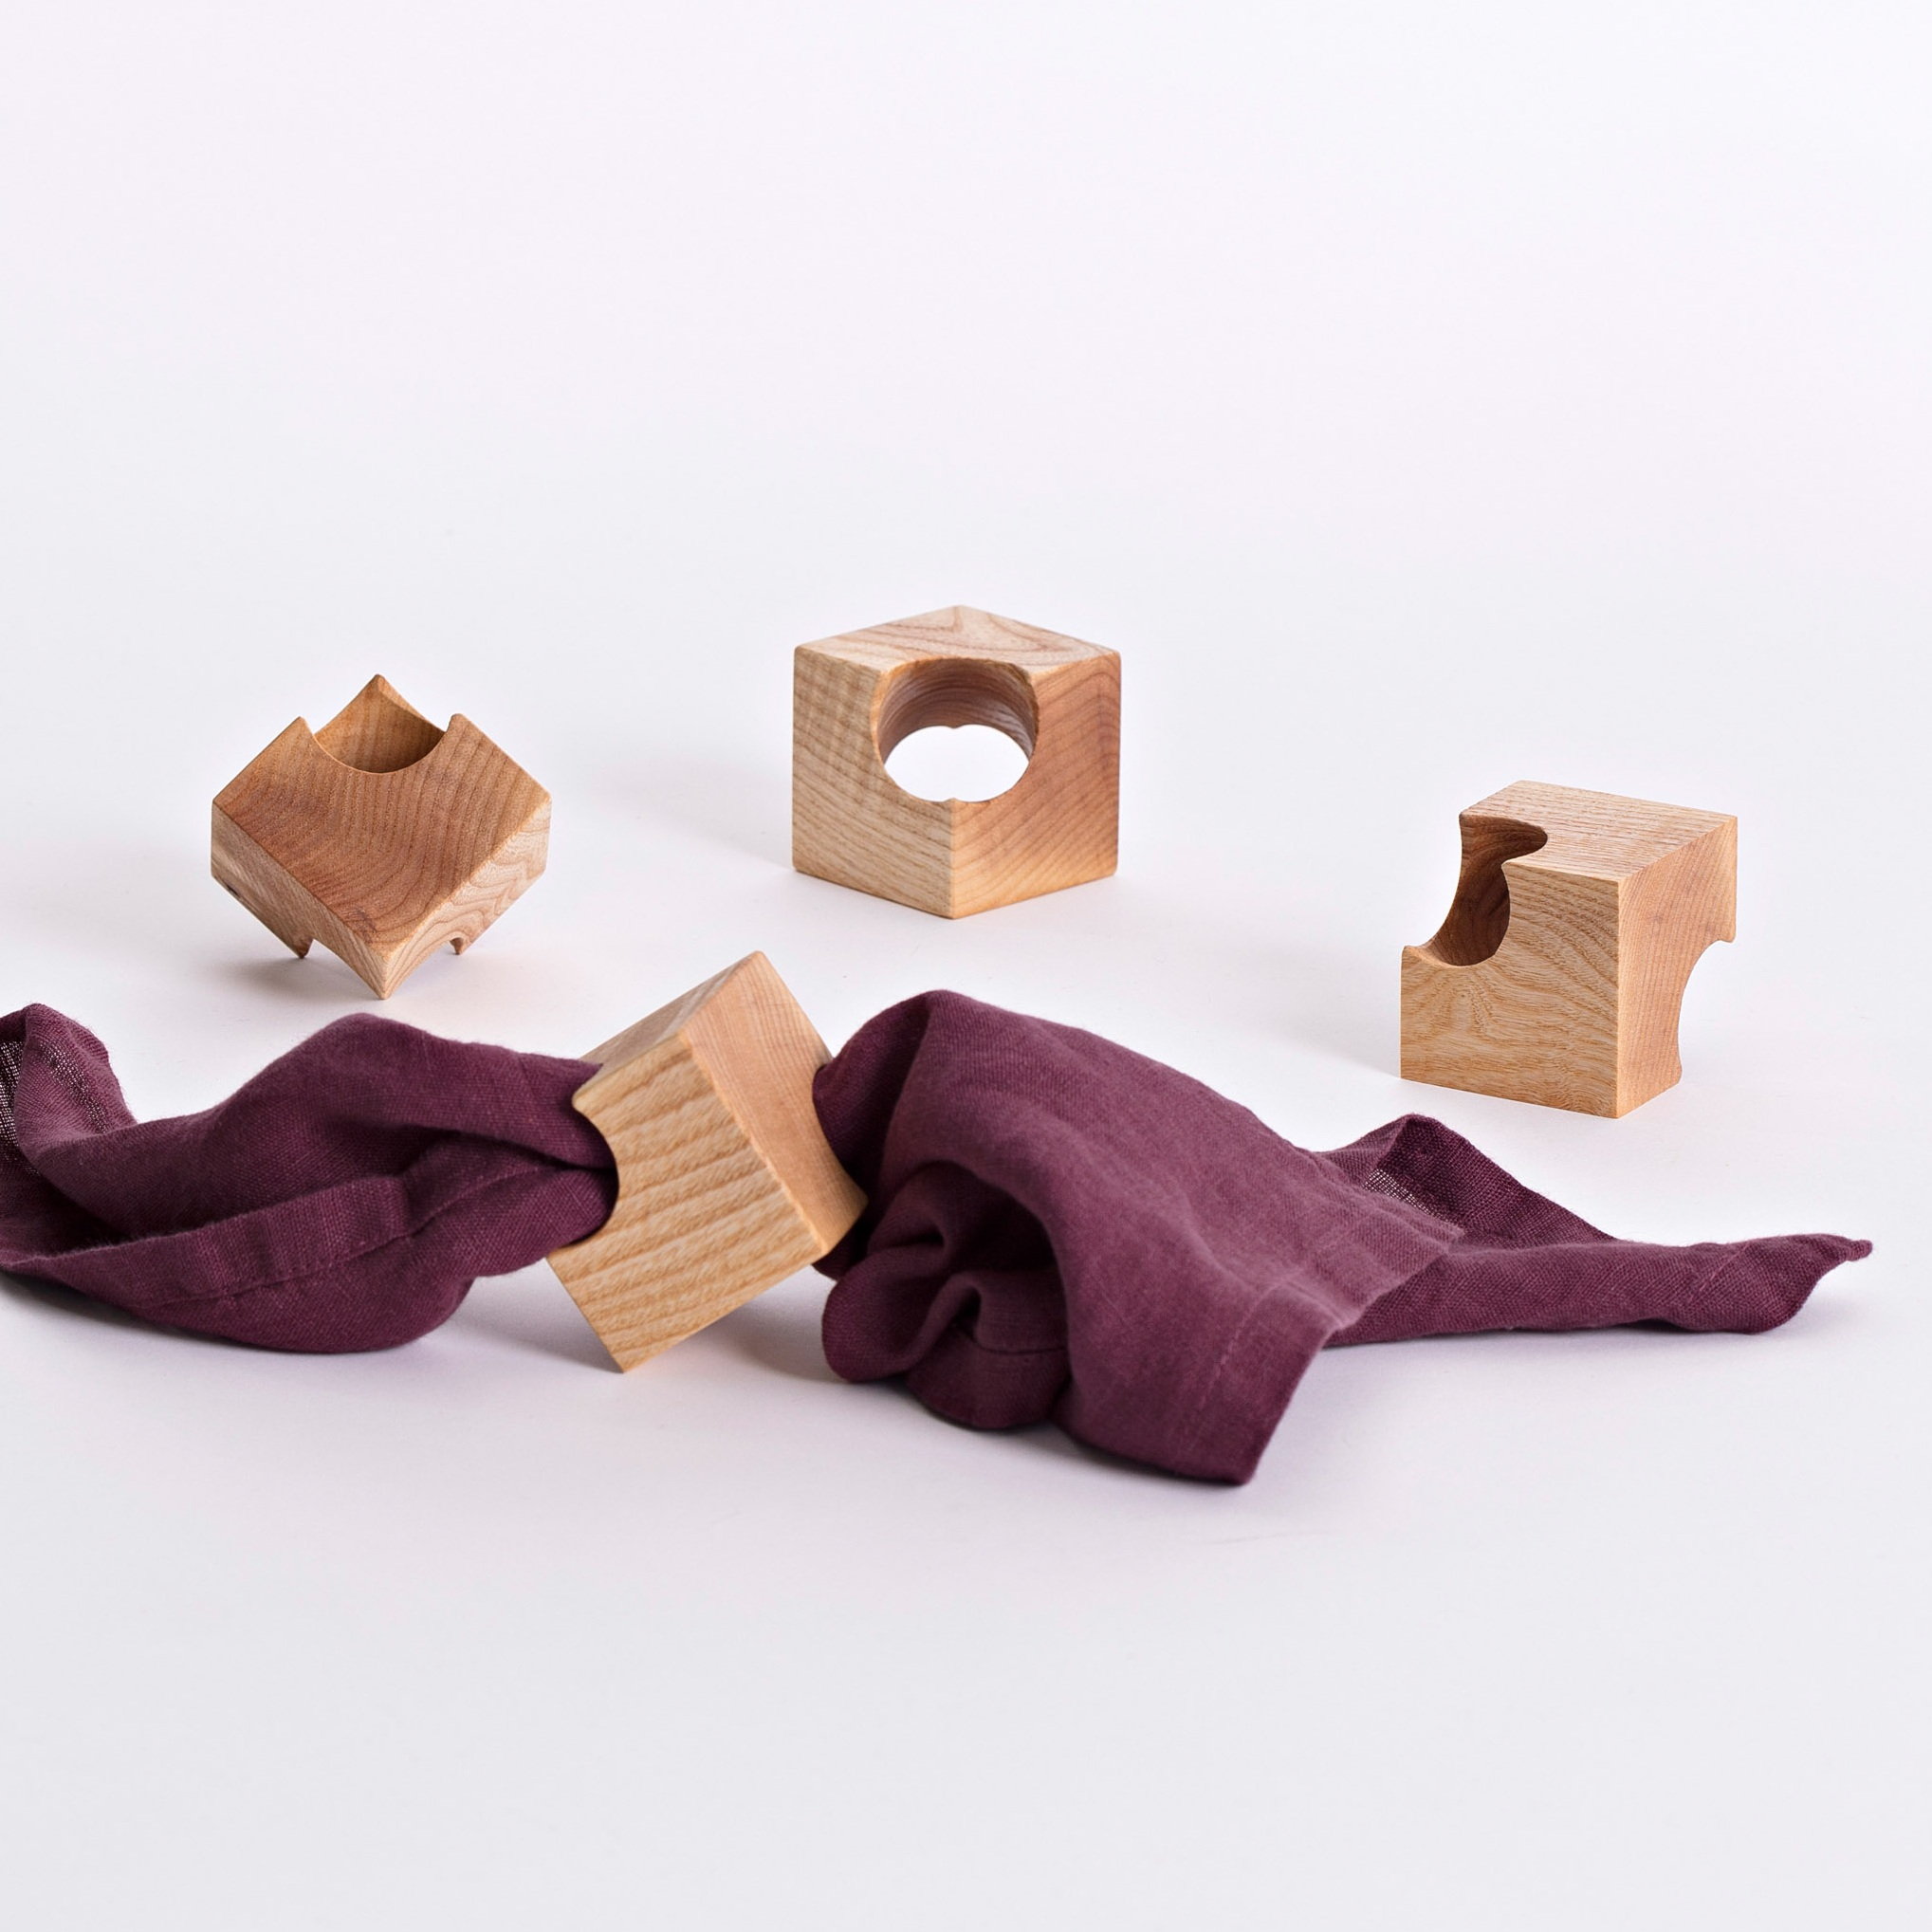 napkin-cubes-wild-Irish-ash1_colinharris.jpg